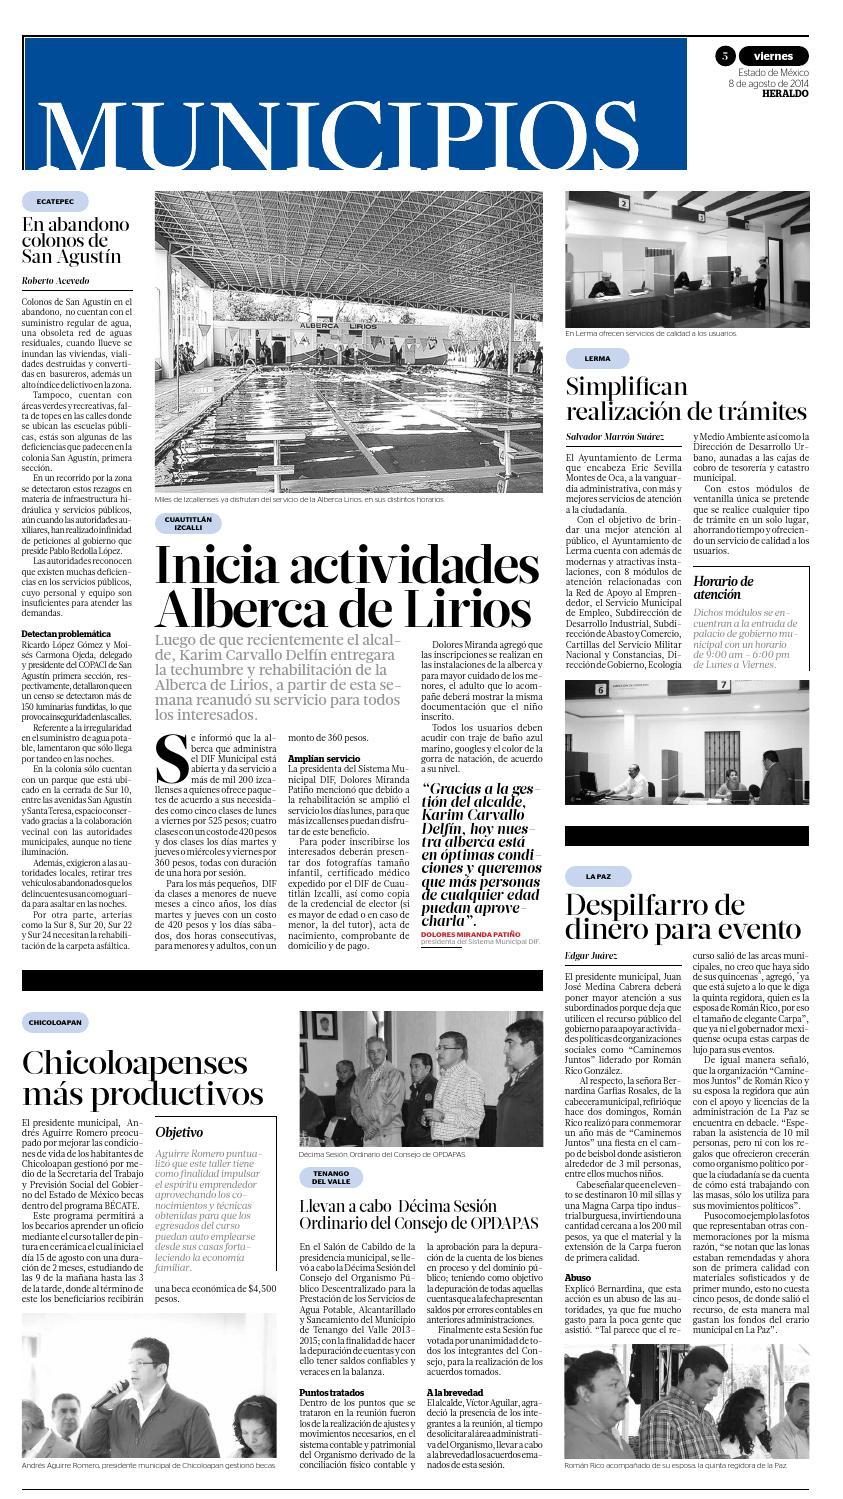 8 De Agosto 2014 By Heraldo Estado De México Issuu